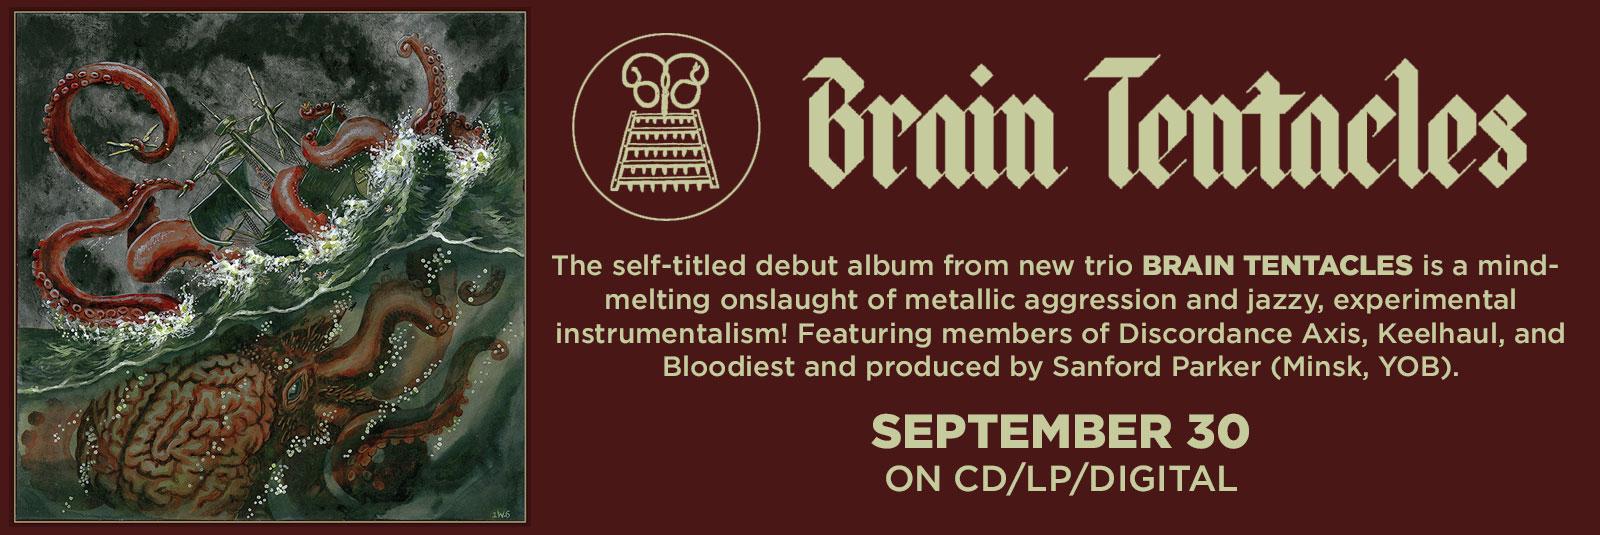 brain-tentacles-new-album-dave-witte-sax-metal